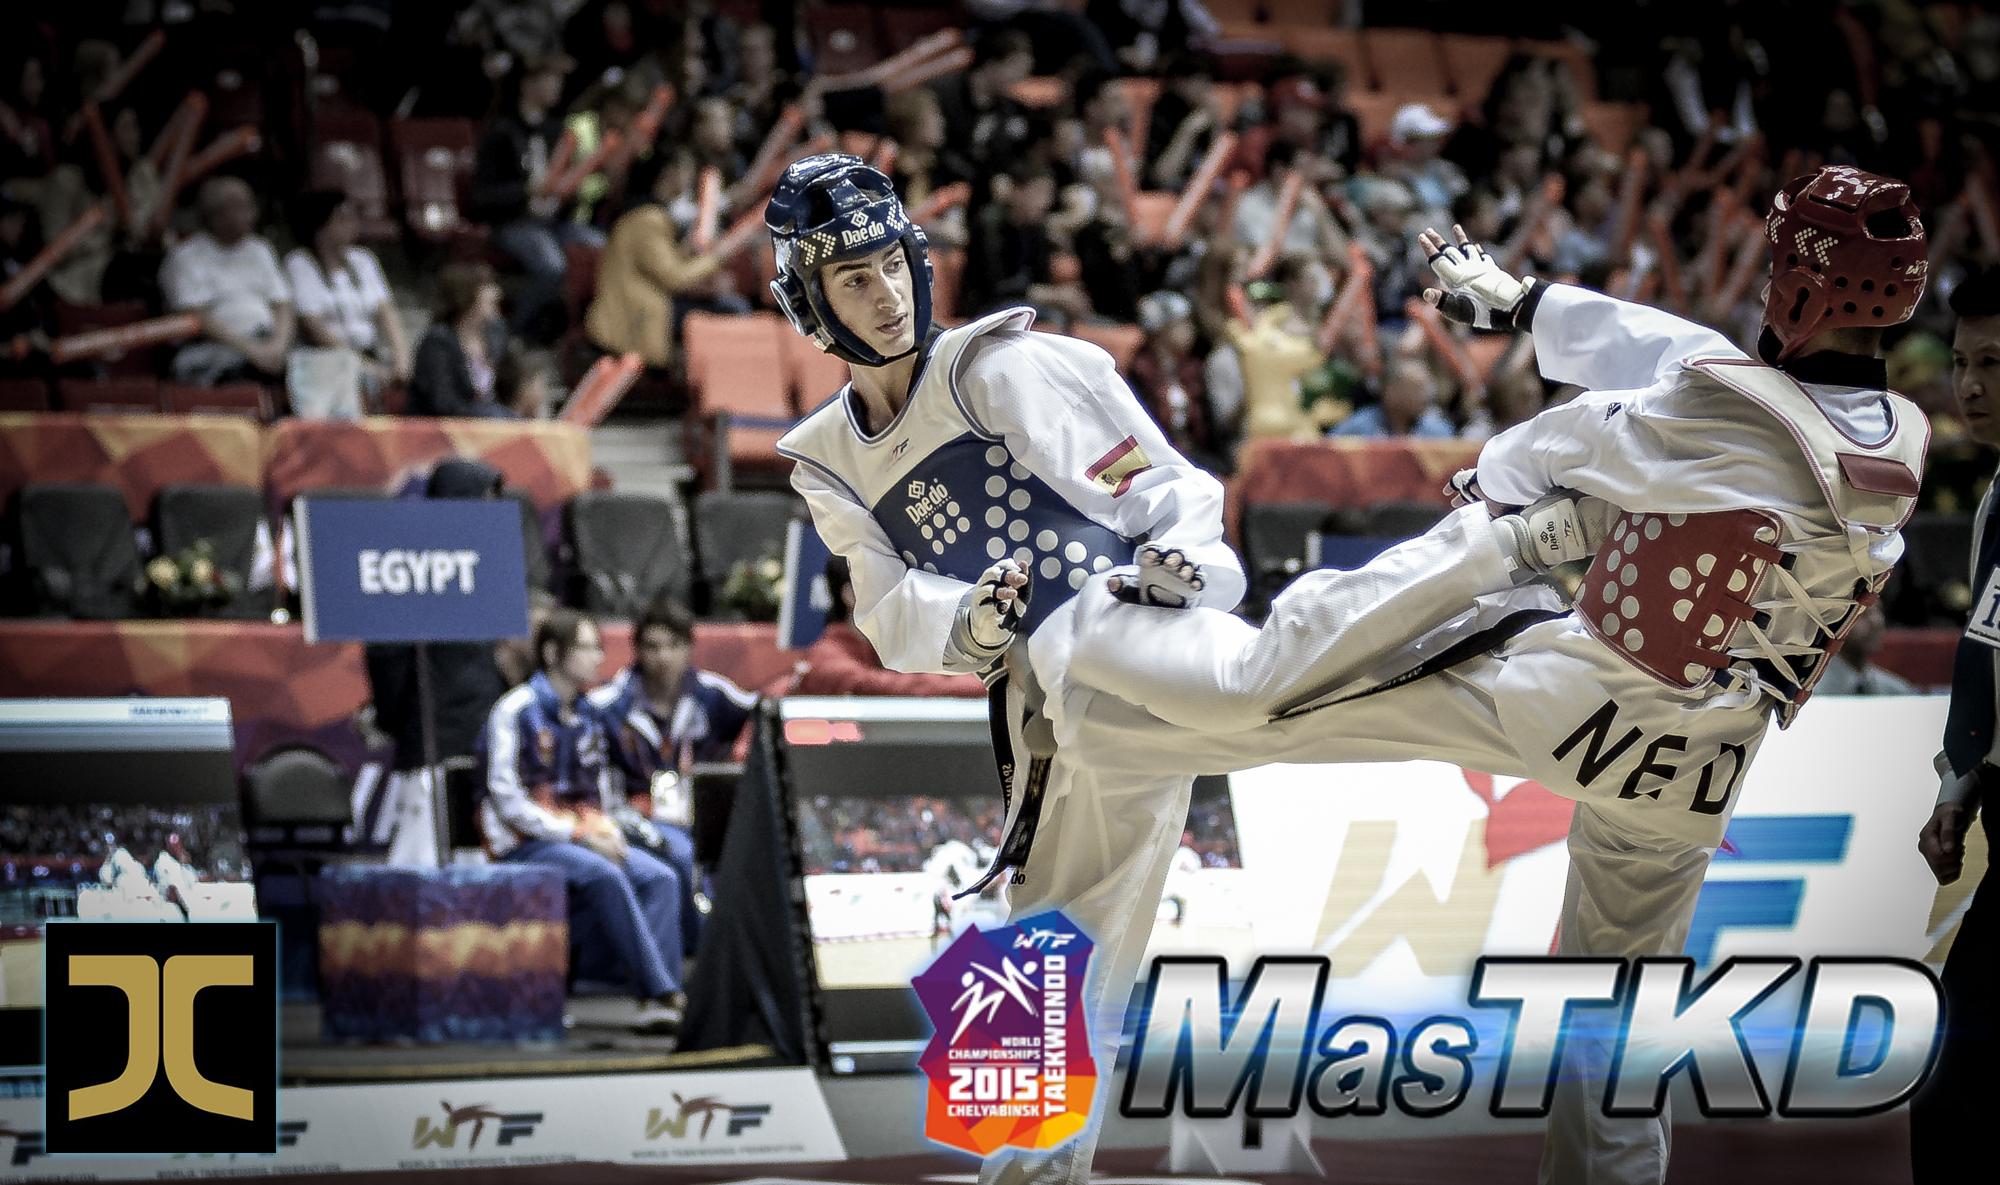 13_JCalicu-Mundial-Taekwondo-Mejores-Imagenes